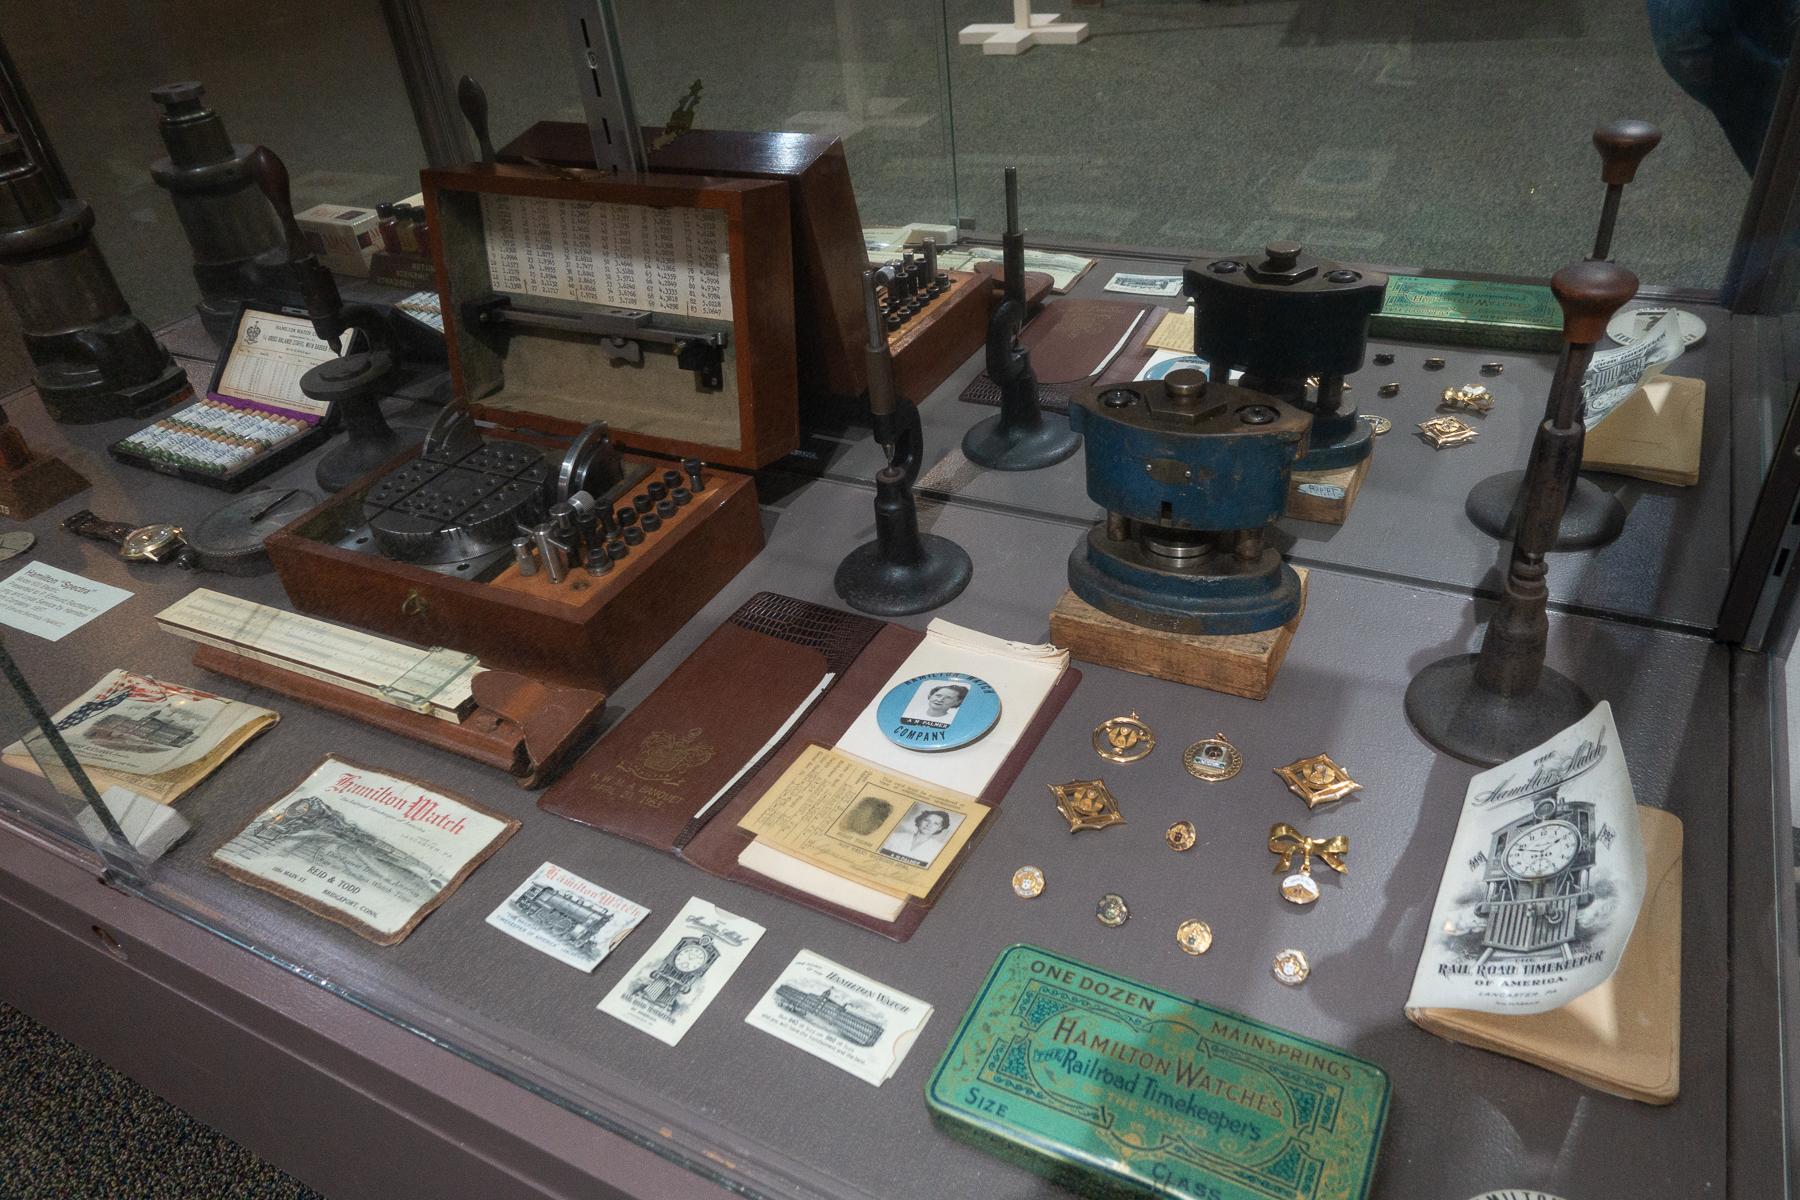 Tools & Awards